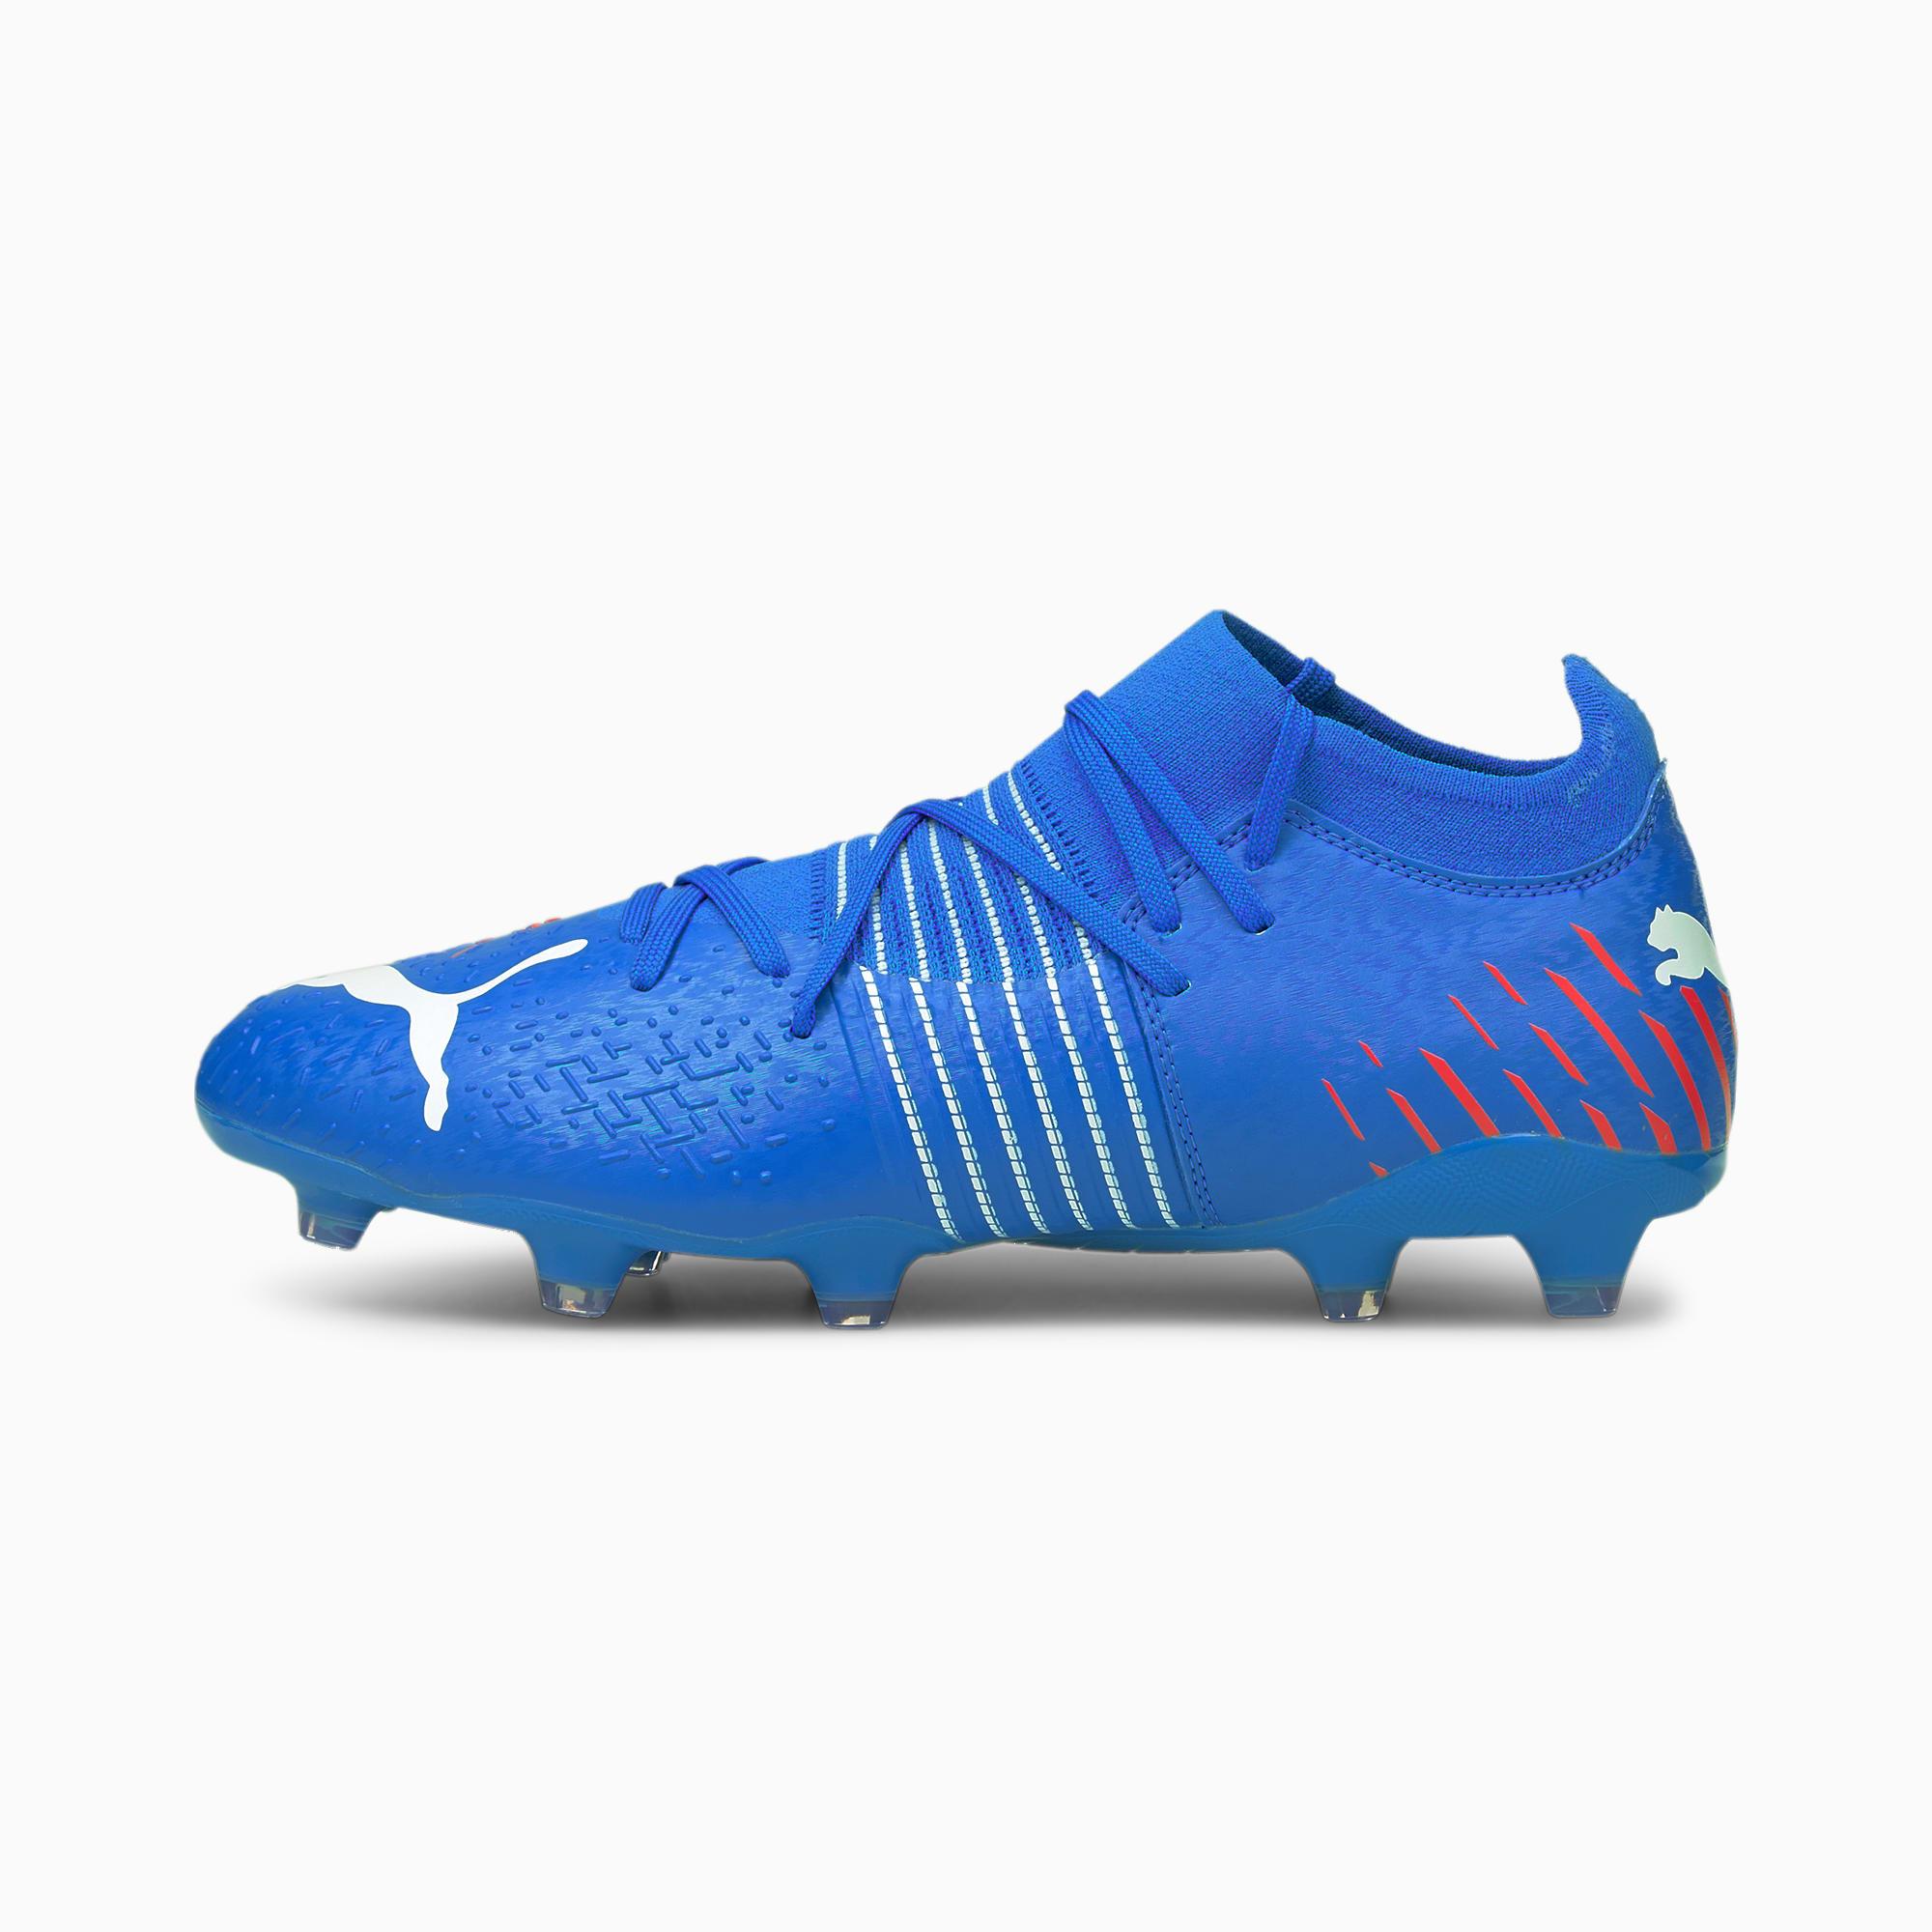 Future Z 3.2 FG/AG Men's Soccer Cleats